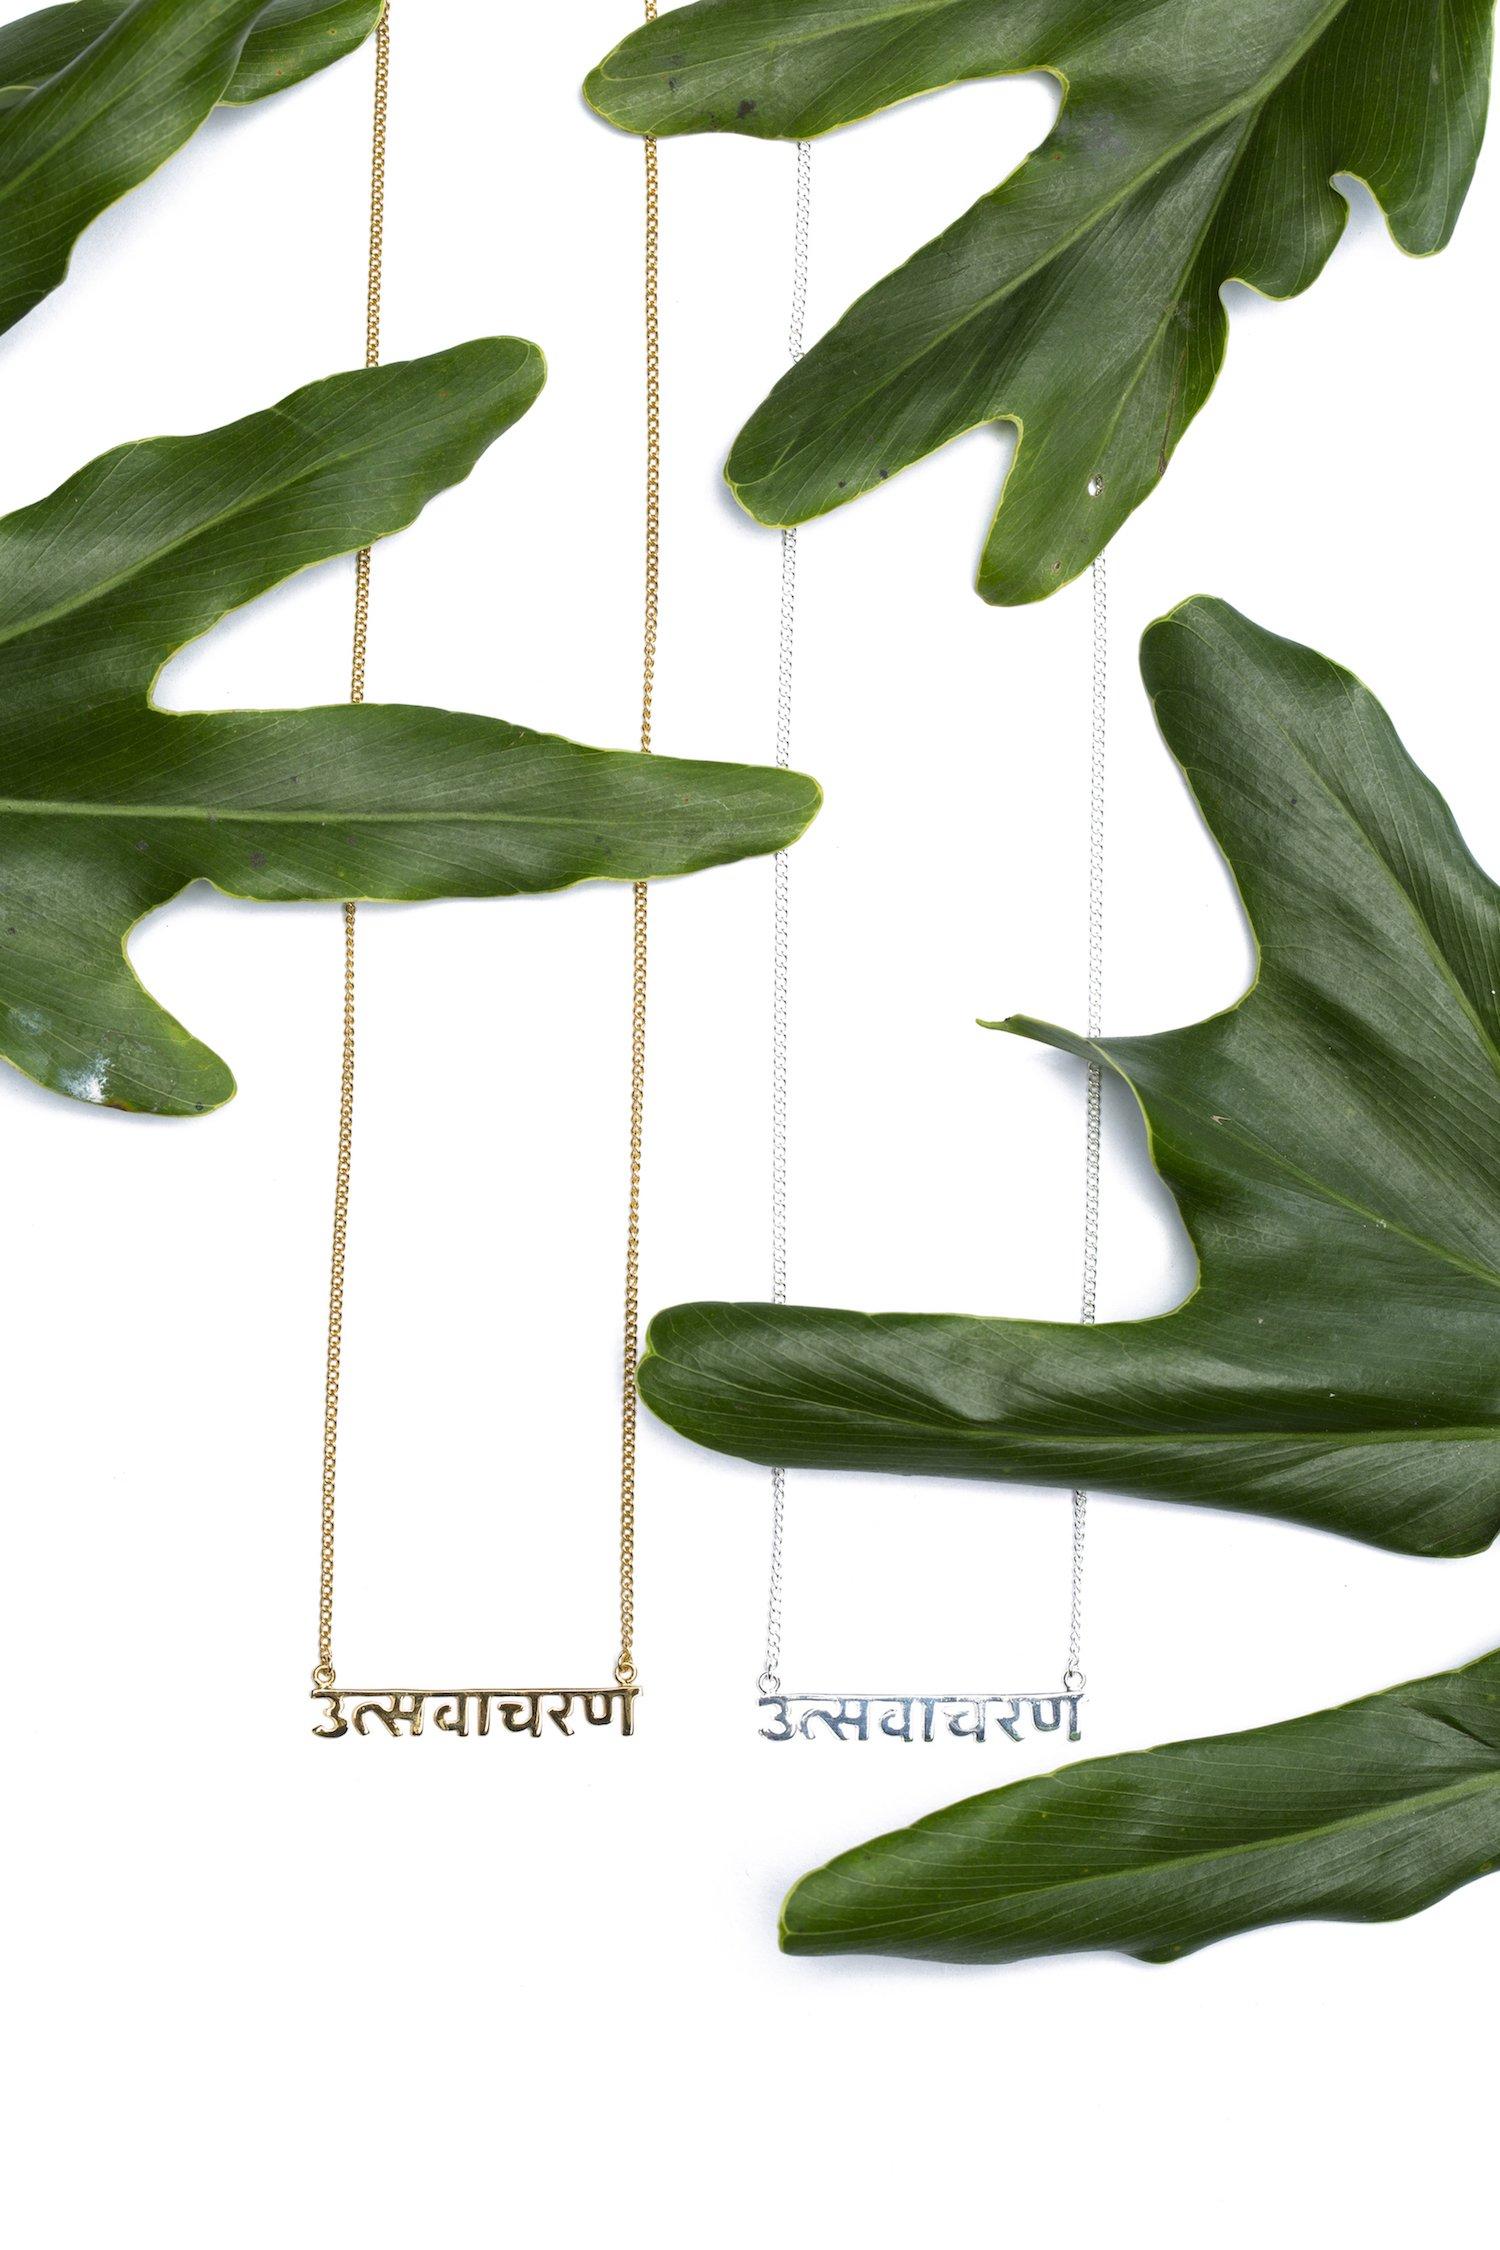 Celebration - Sanskrit Necklace (Silver)